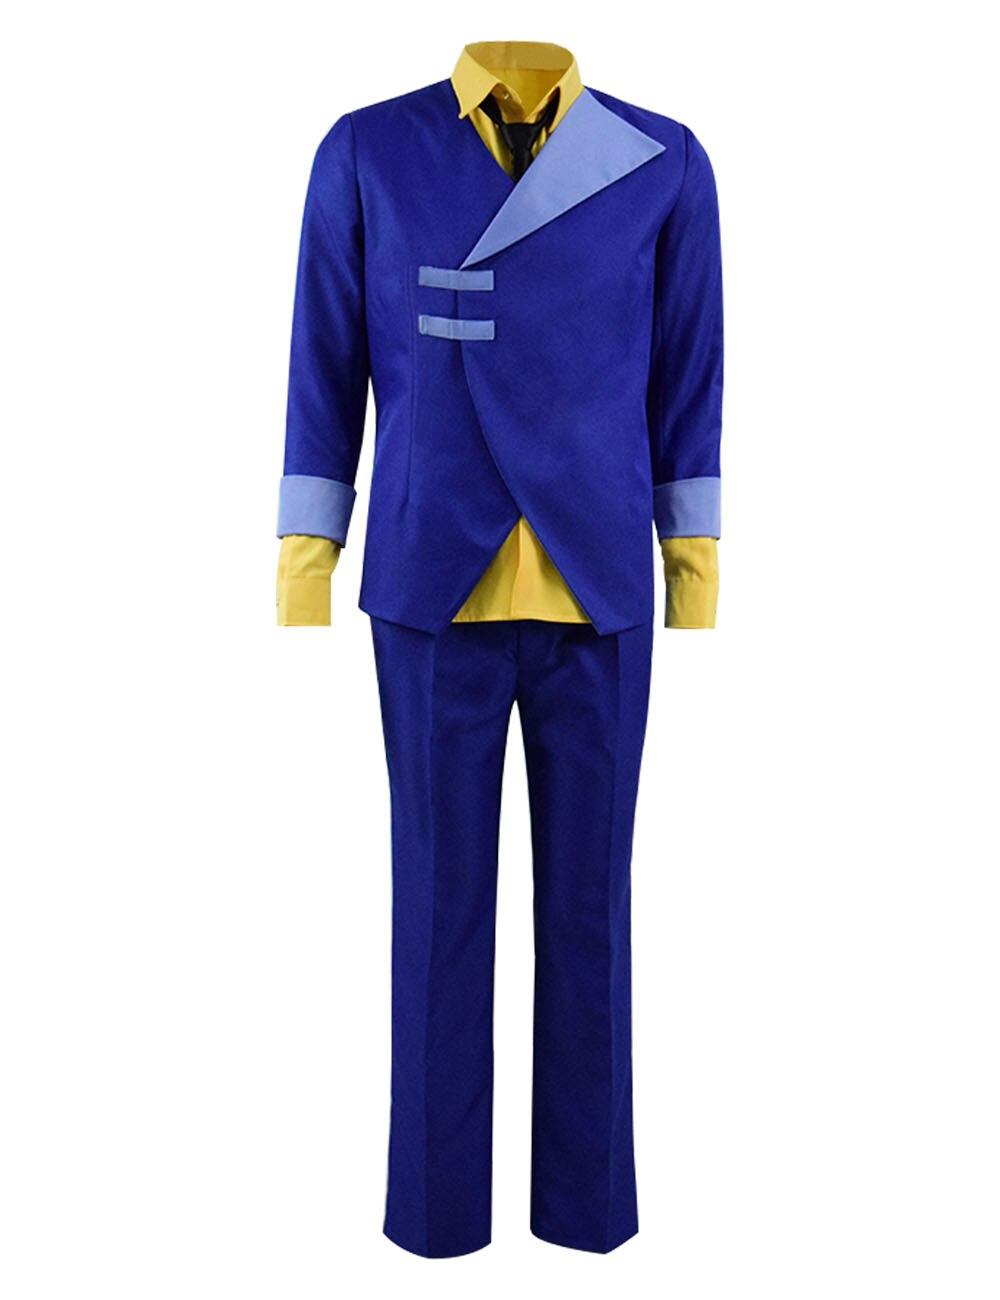 Cowboy Bebop Spike Spiegel Cosplay Costume Men's Full Set Anime Cosplay Suit